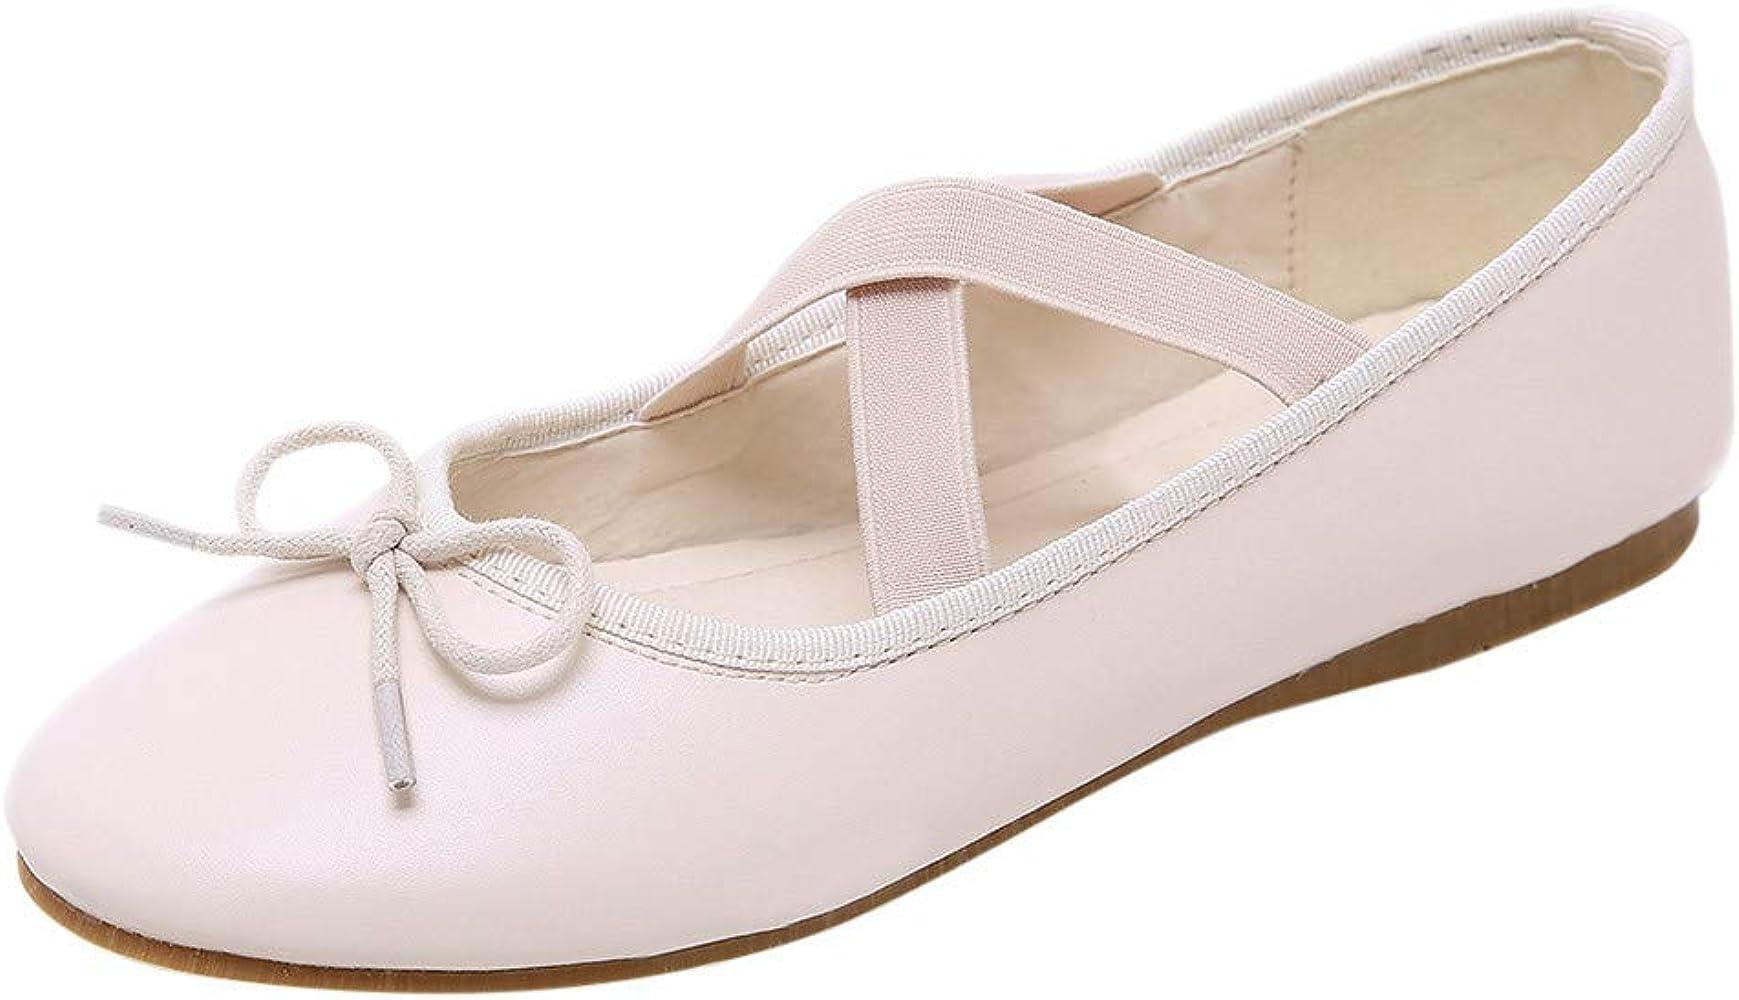 VECDY Zapatos De Baile, Zapatos Mujeres Casuales Zapatos De ...